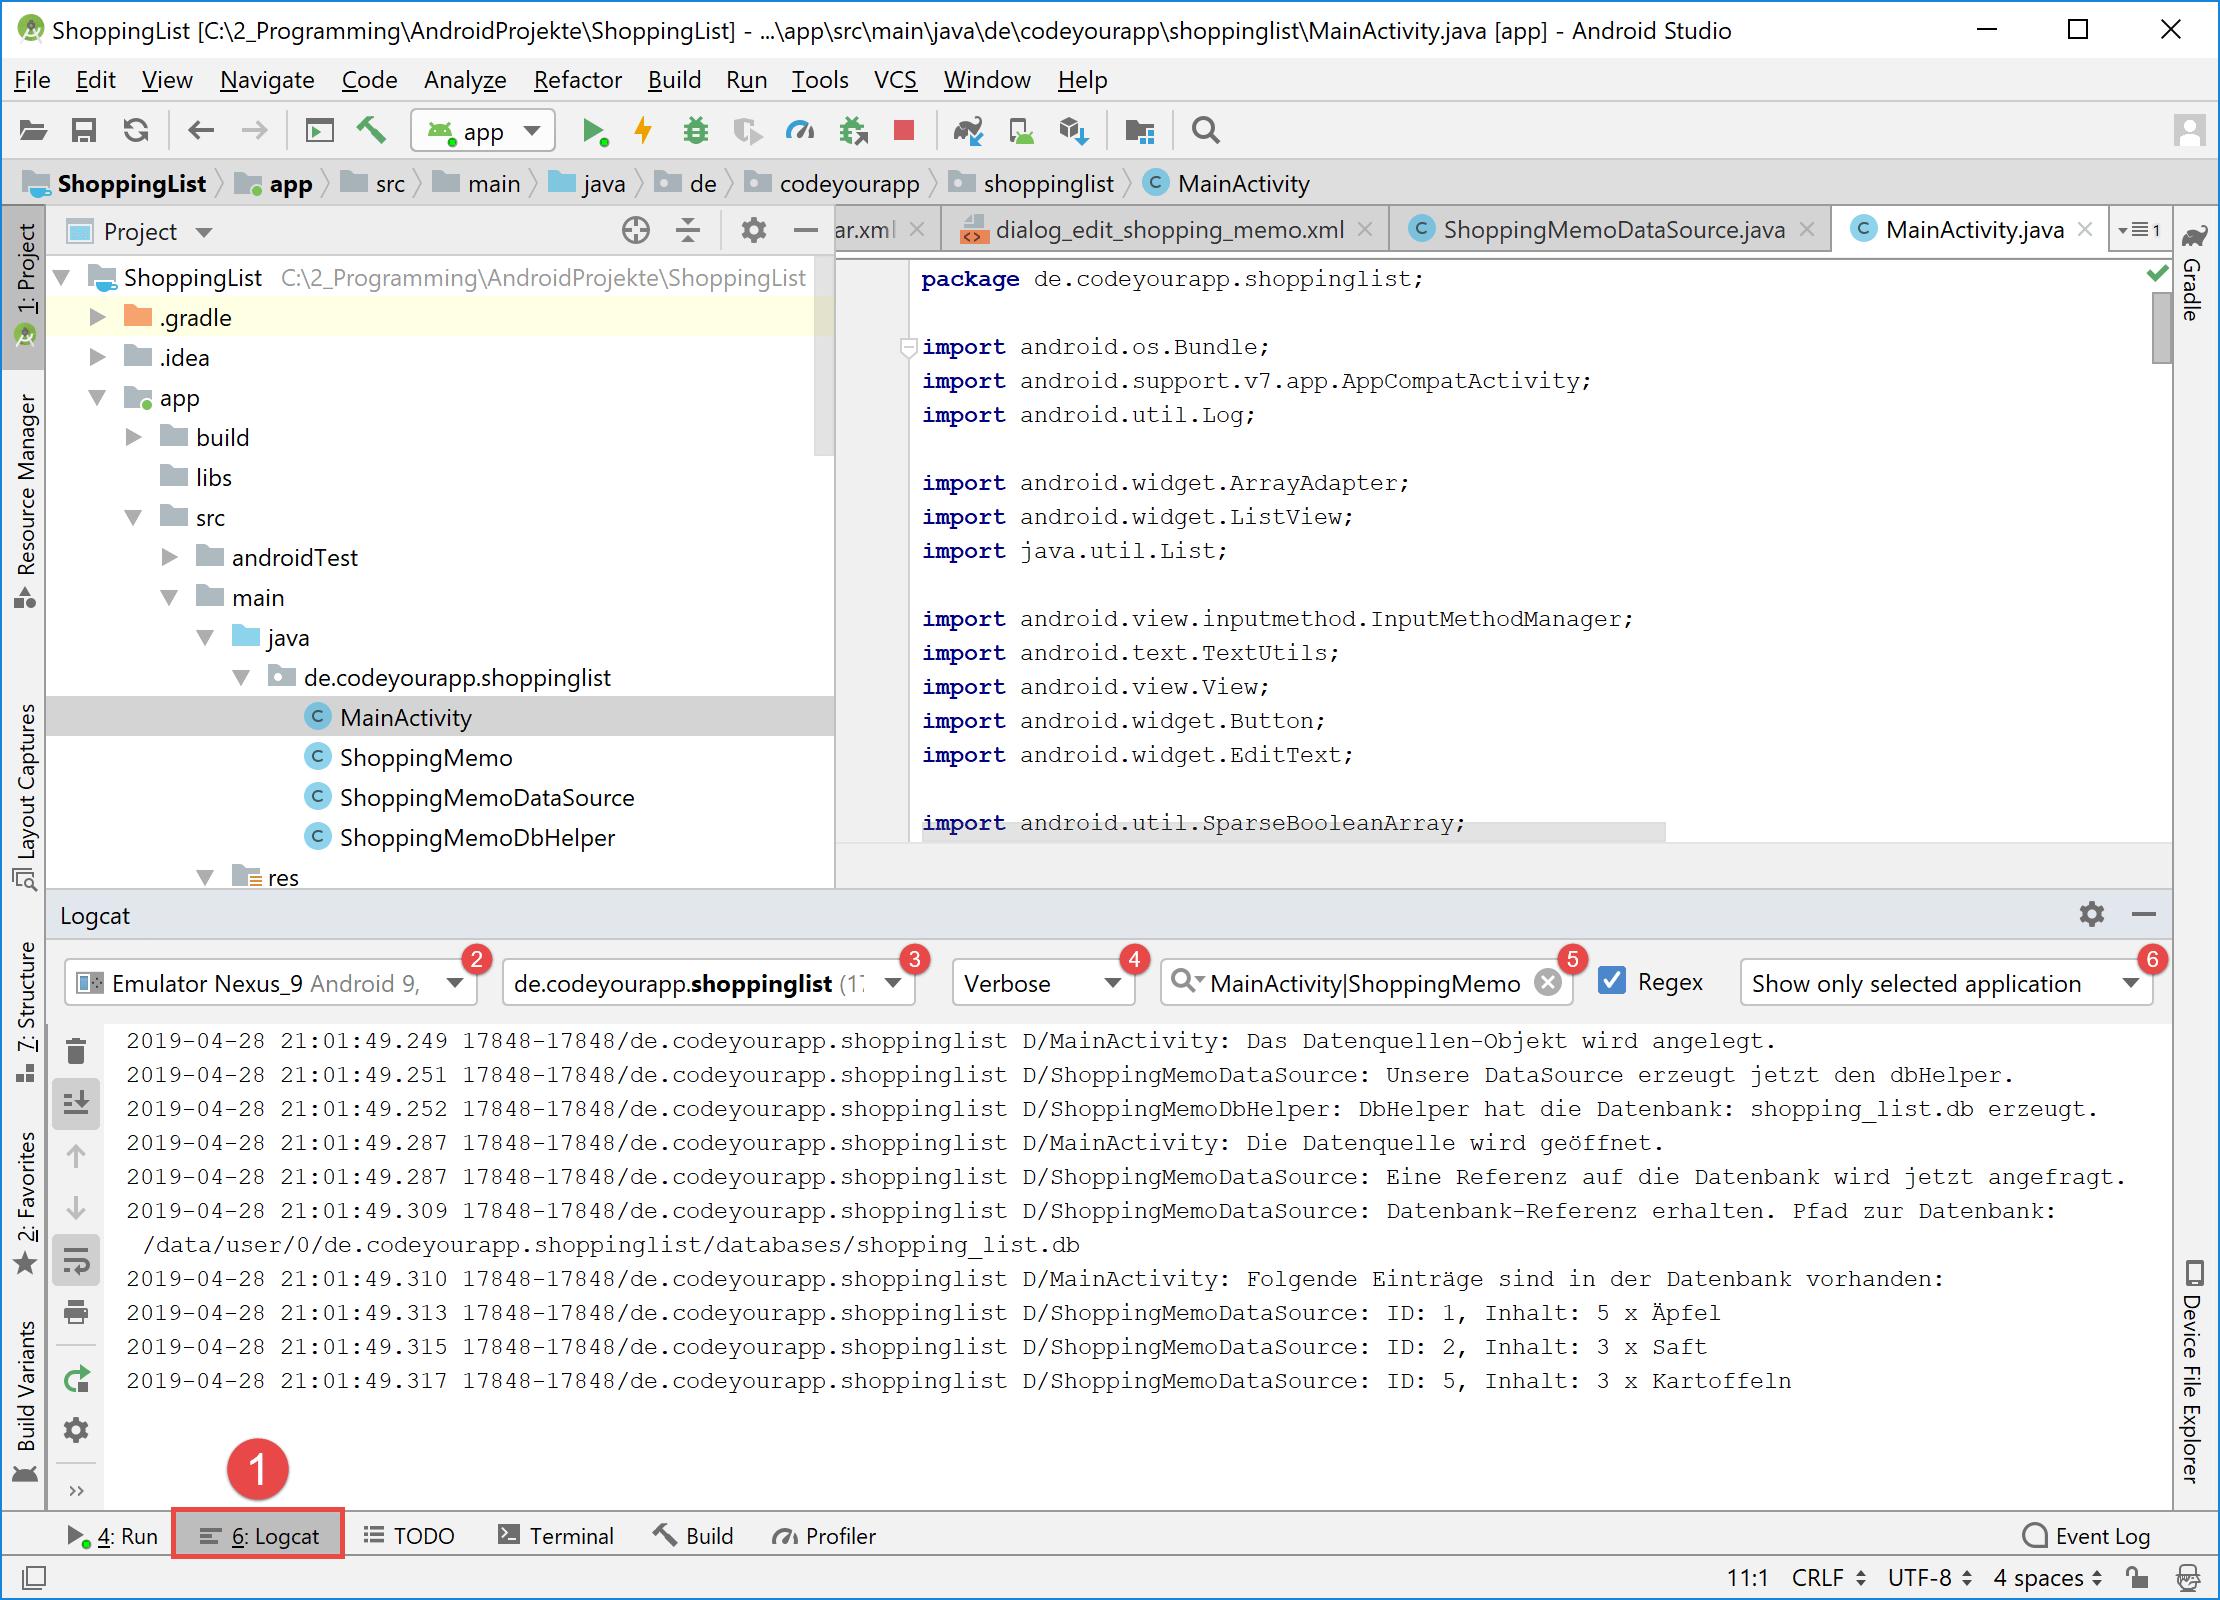 android_sqlite_update_logcat_start